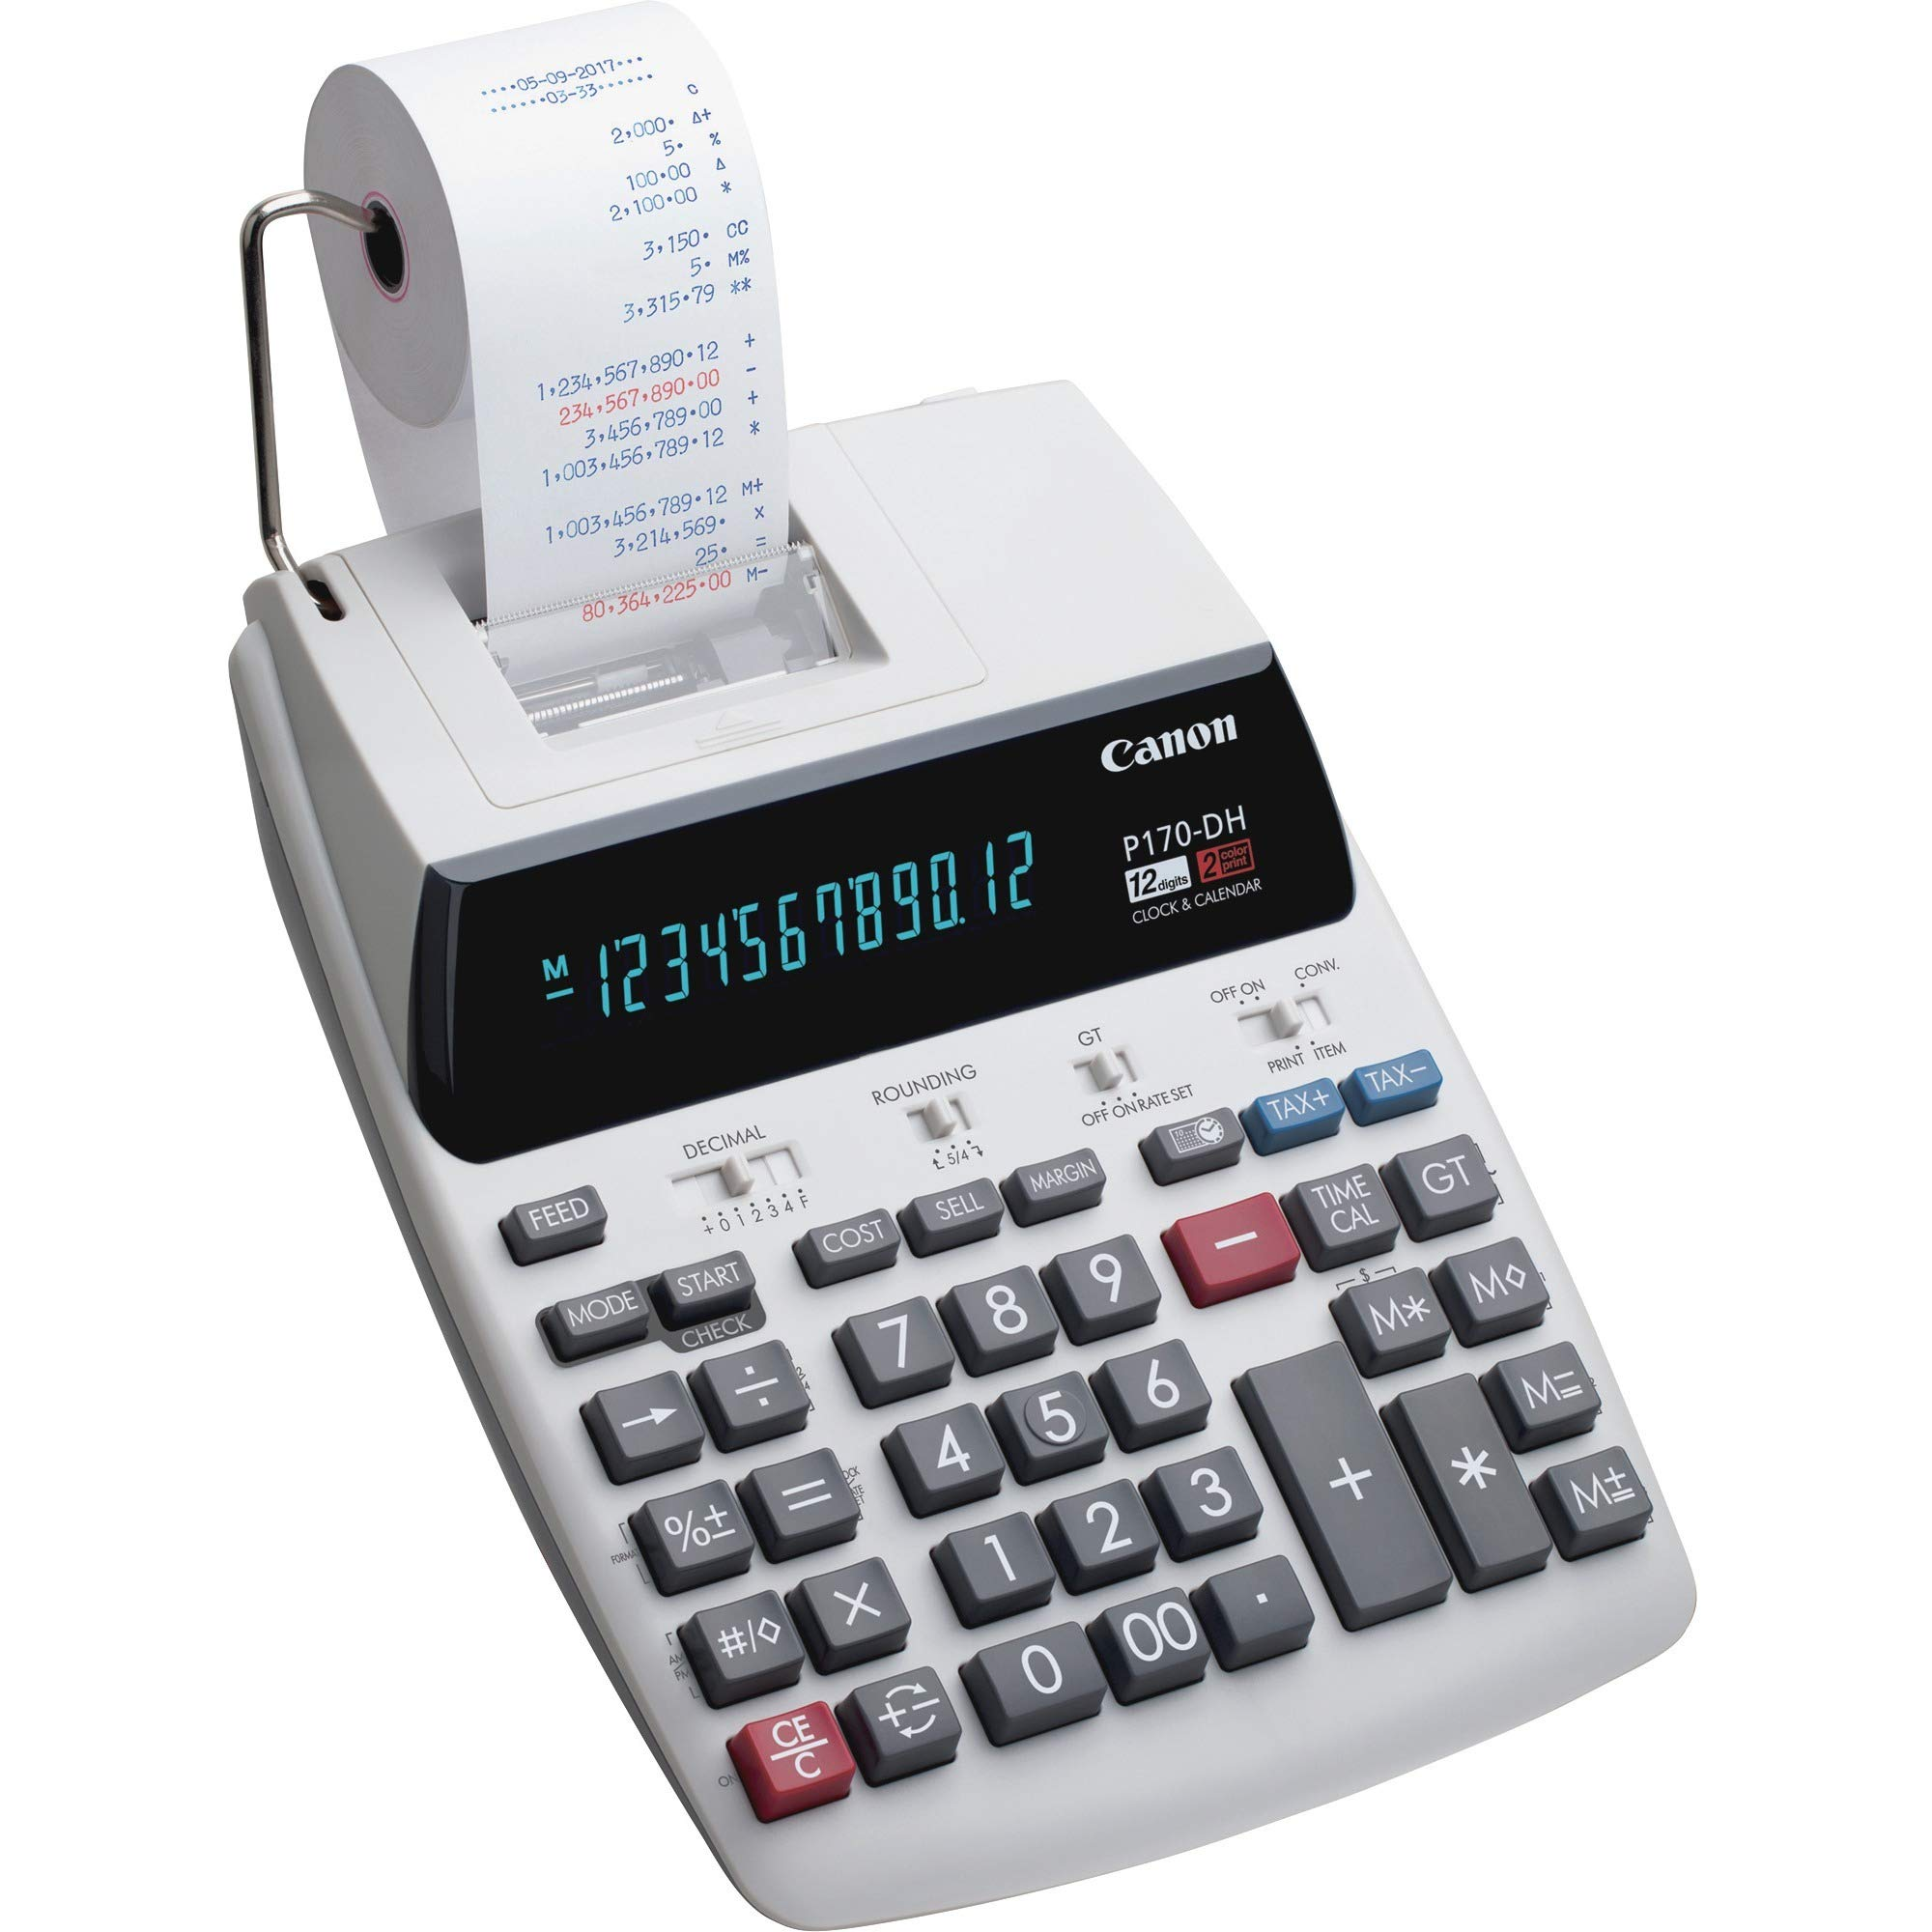 Canon P170DH3 12-Digit Desktop Printing Calculator, White